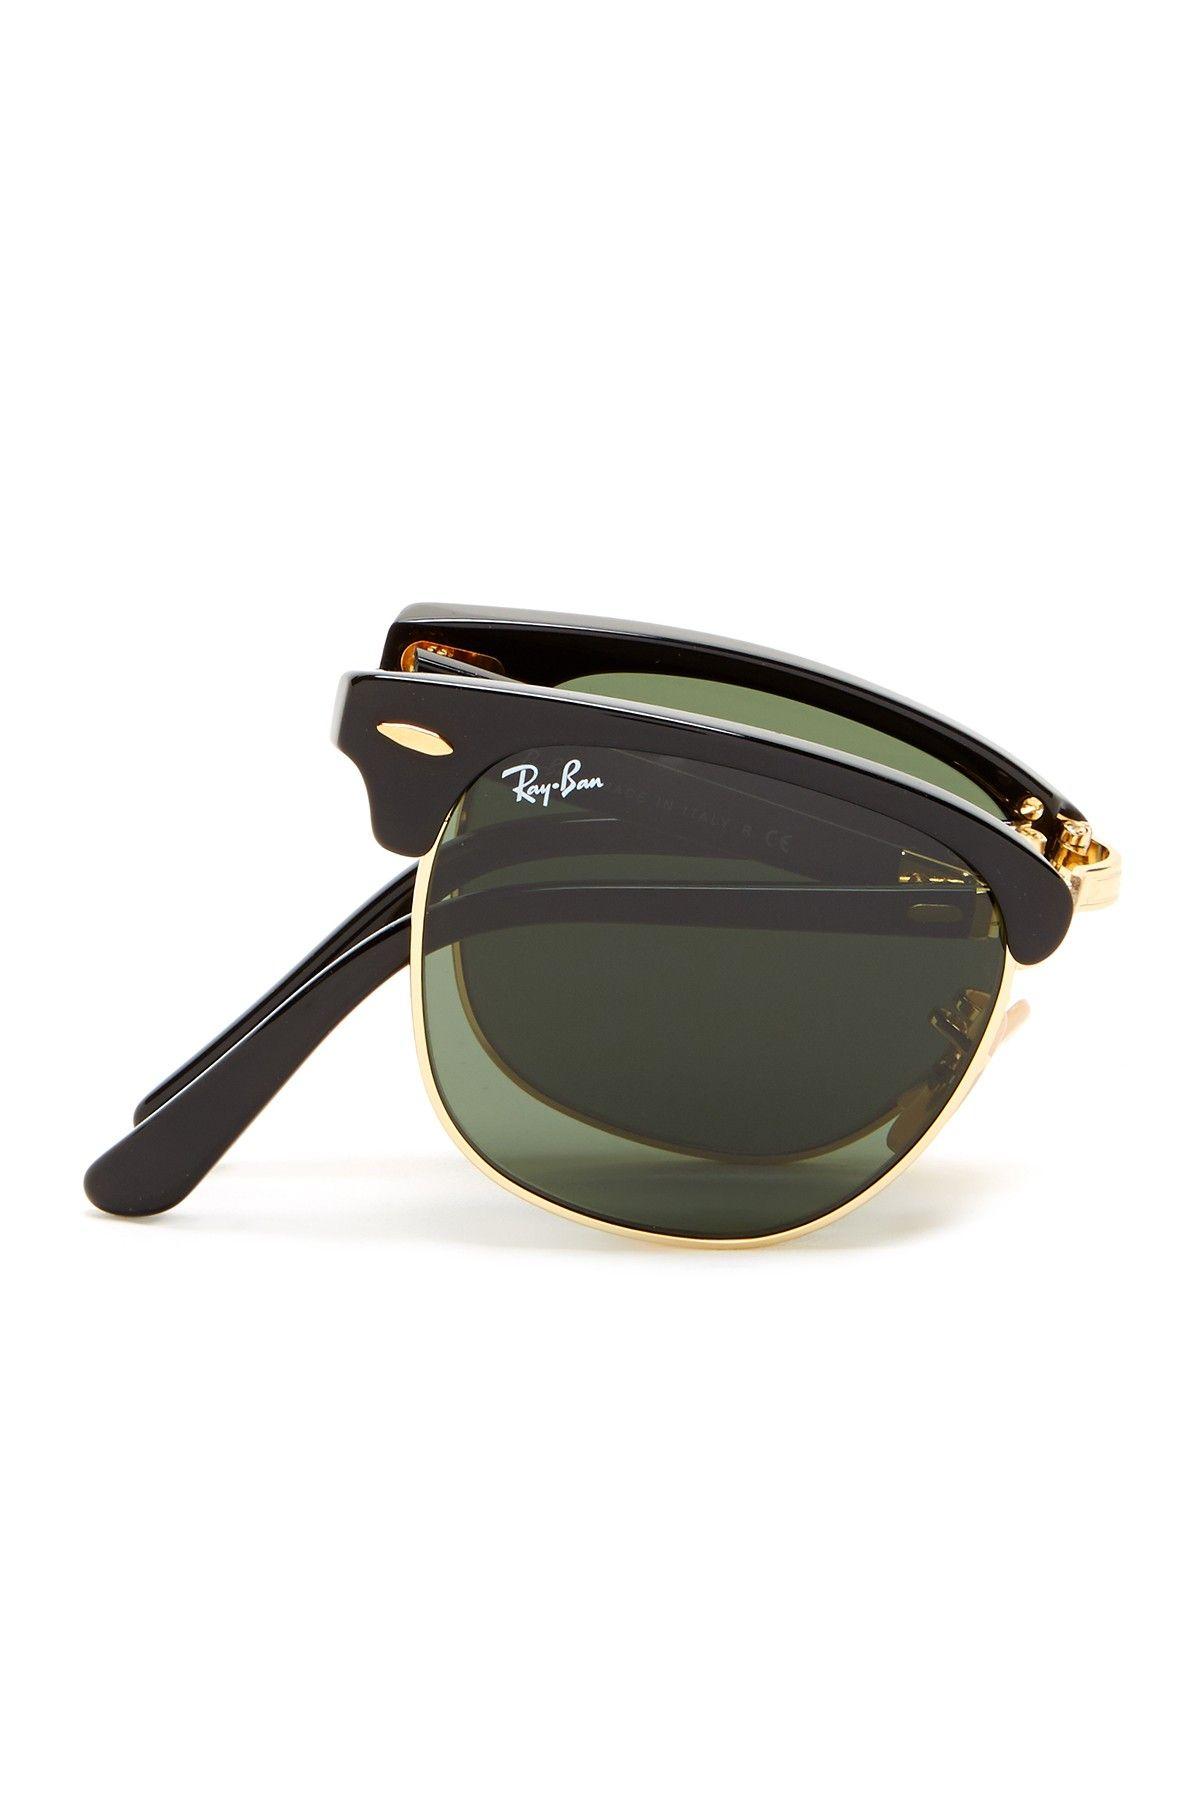 c9fdcbd2ba1 Ray-Ban Unisex Folding Metal Plastic Sunglasses